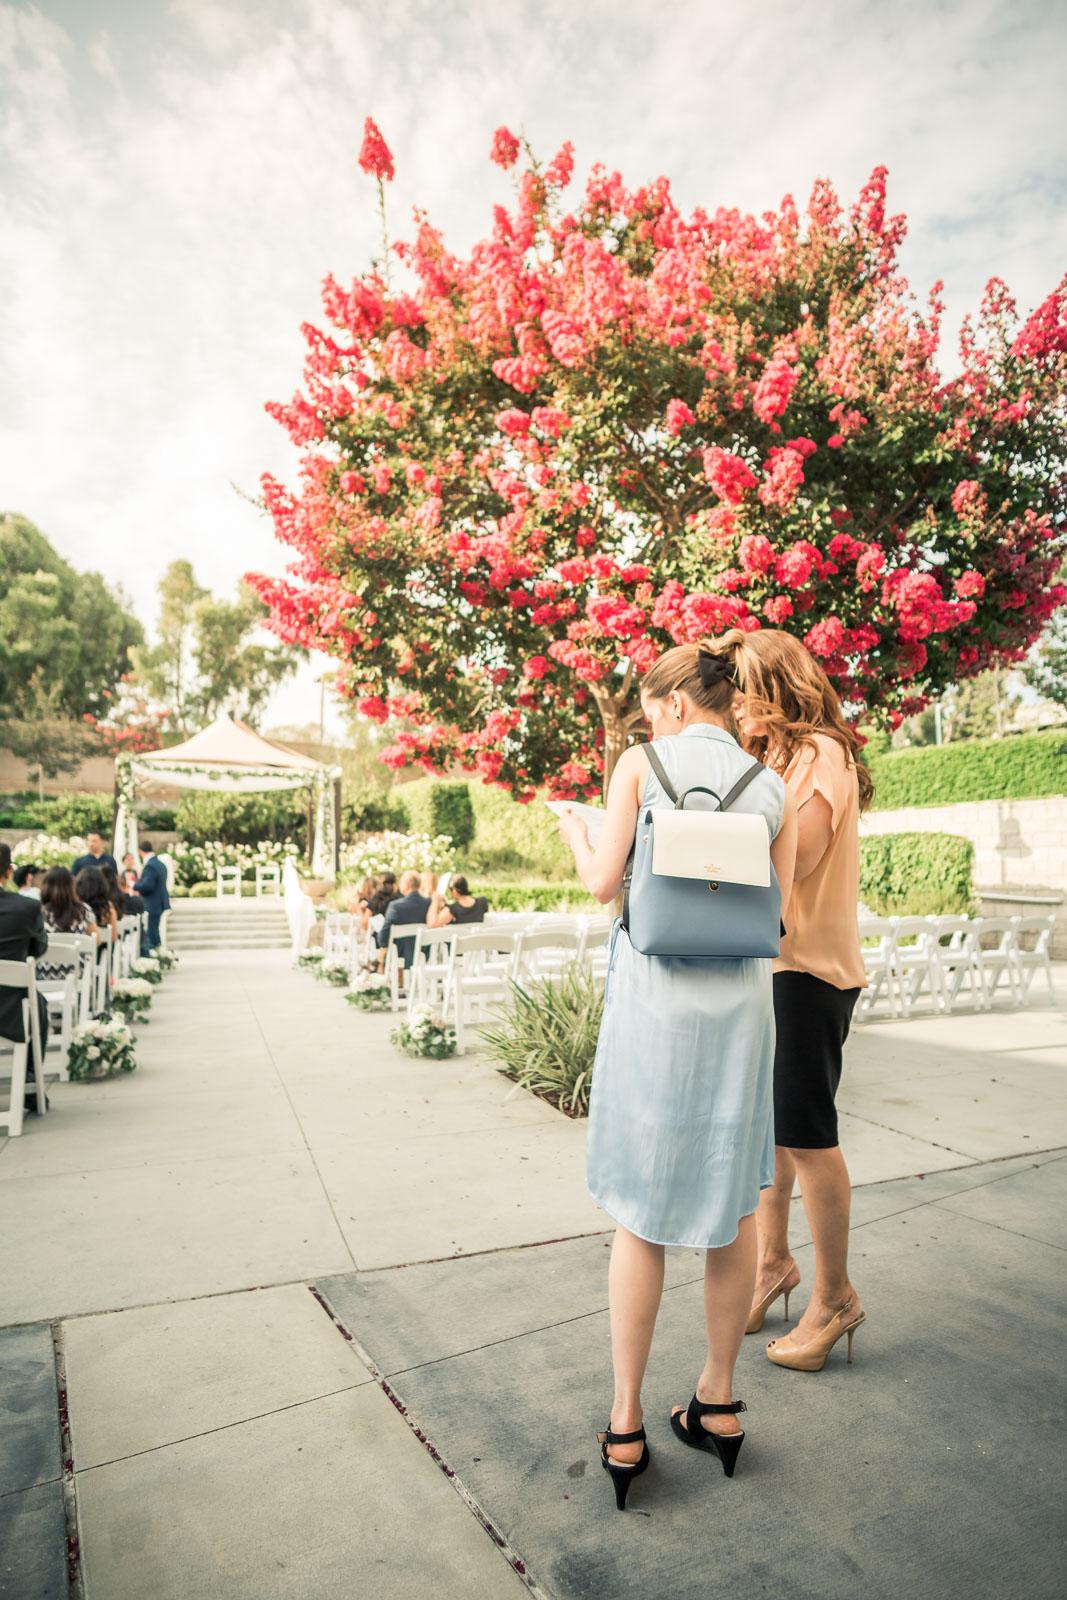 112_Angel-Brea-Orange-County_Joseph-Barber-Wedding-Photography.jpg